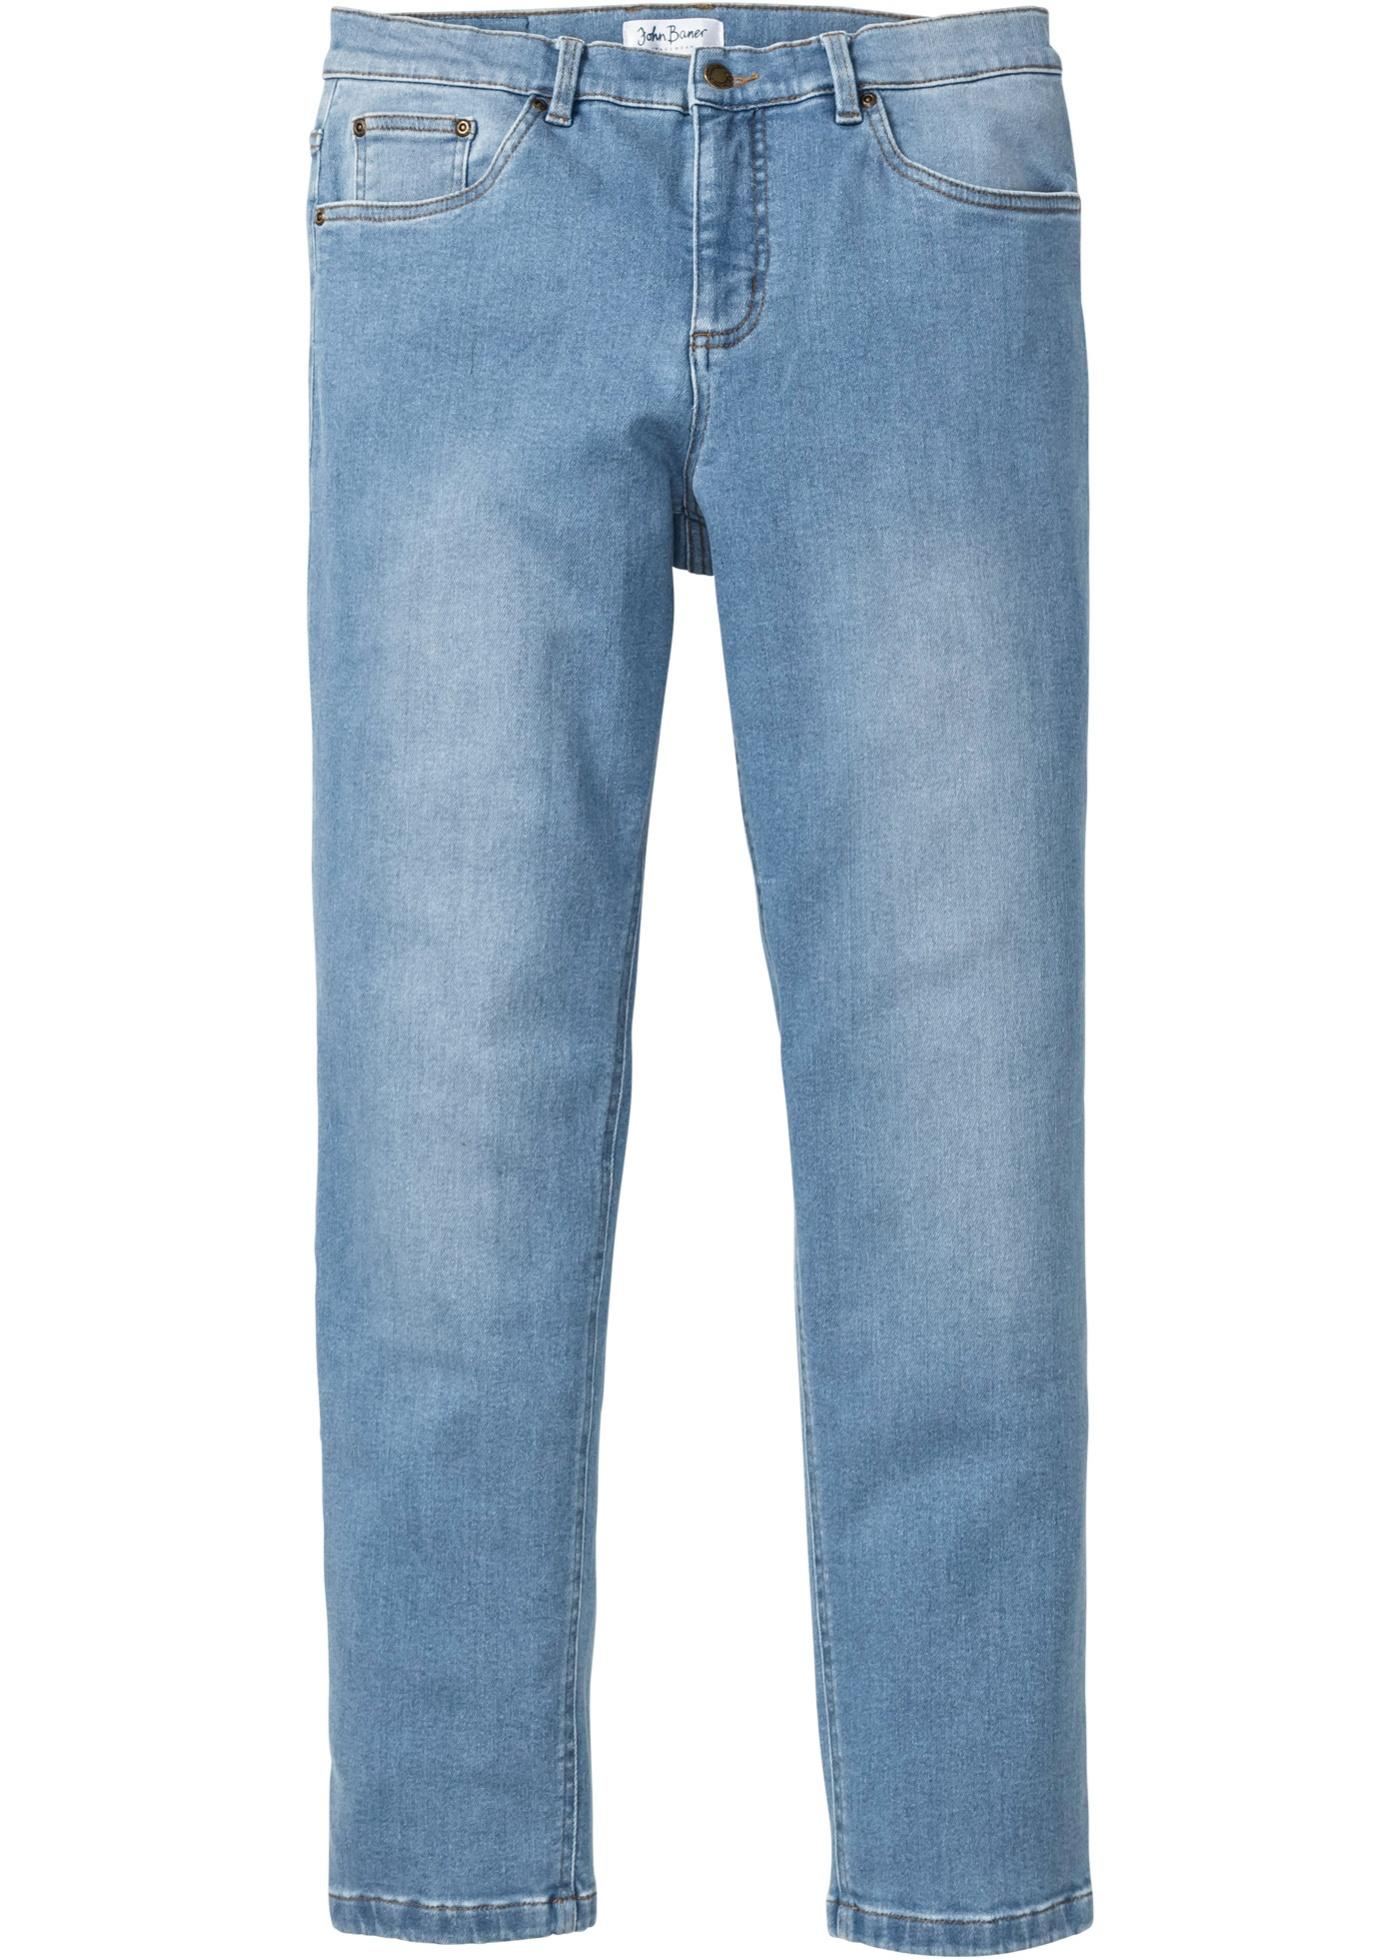 Bonprix - Jeans, klassisk modell, avsmalnande ben 299.00